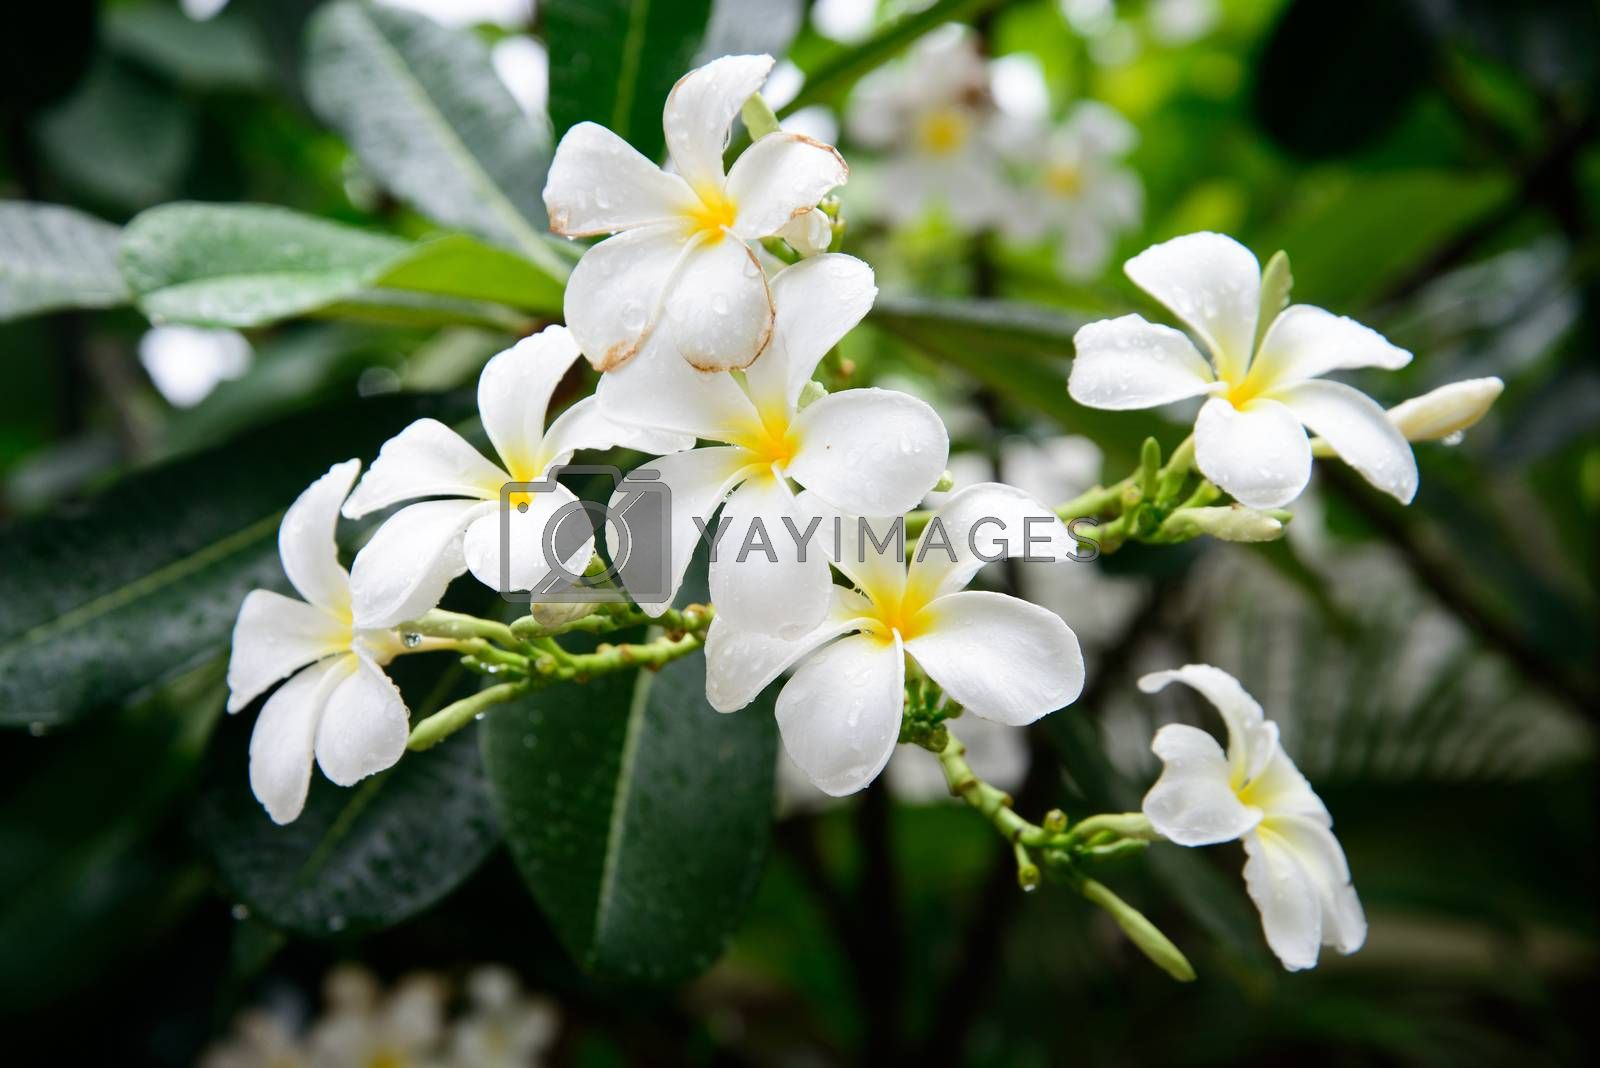 White Frangipani flower after rain  by jakgree